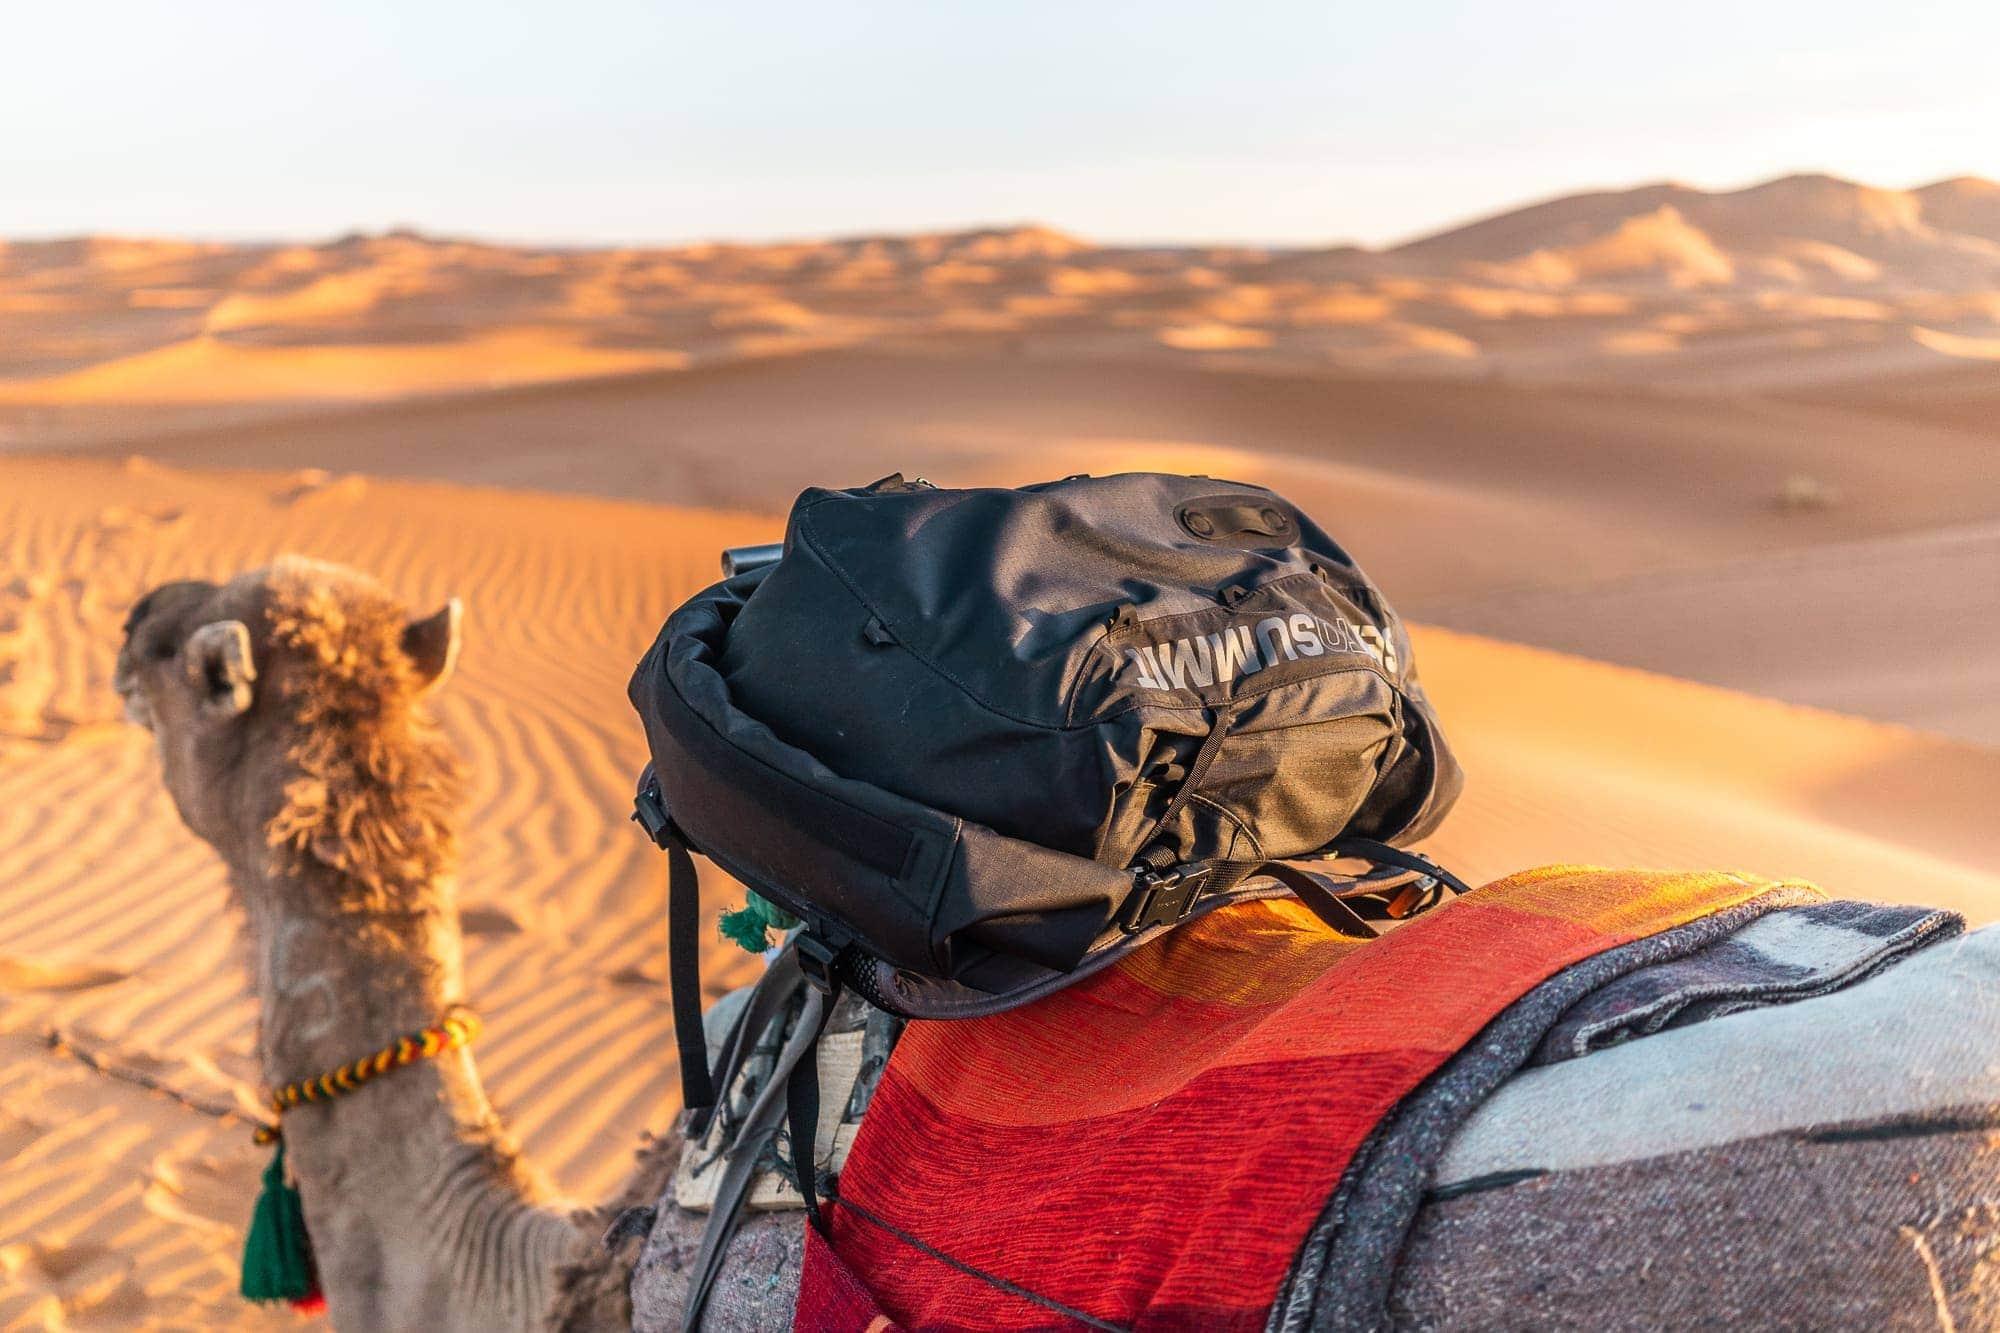 Morocco-camel-sahara-desert-sea-to-summit